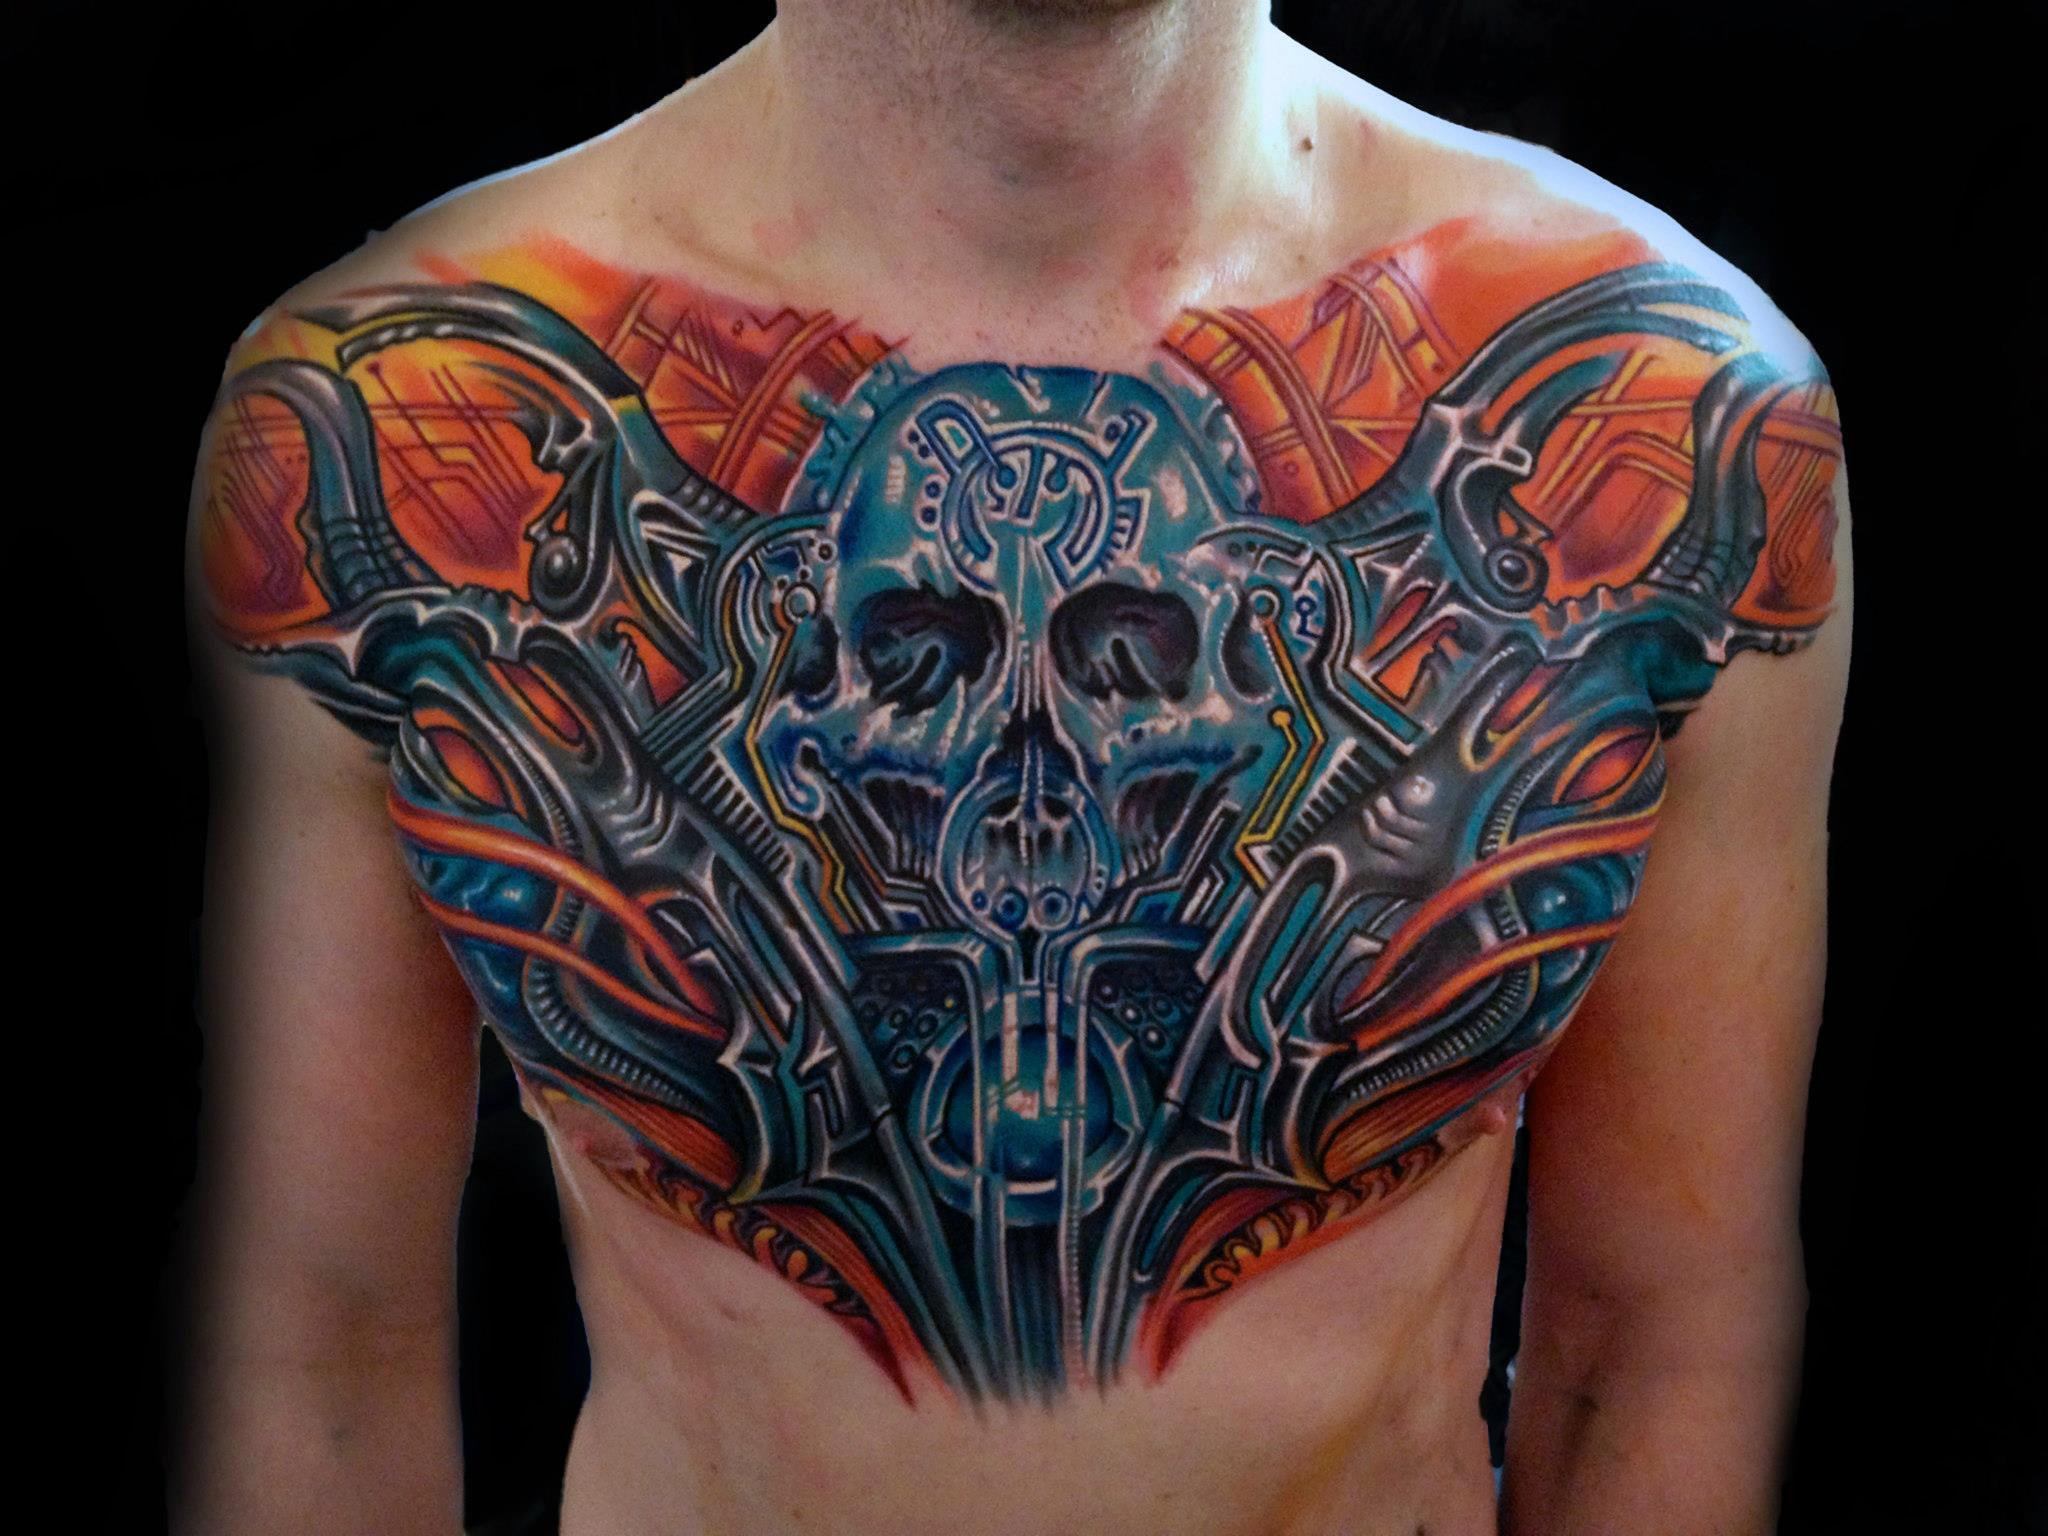 Biomechanical Tattoos For Men On Chest Tattoo Bytes